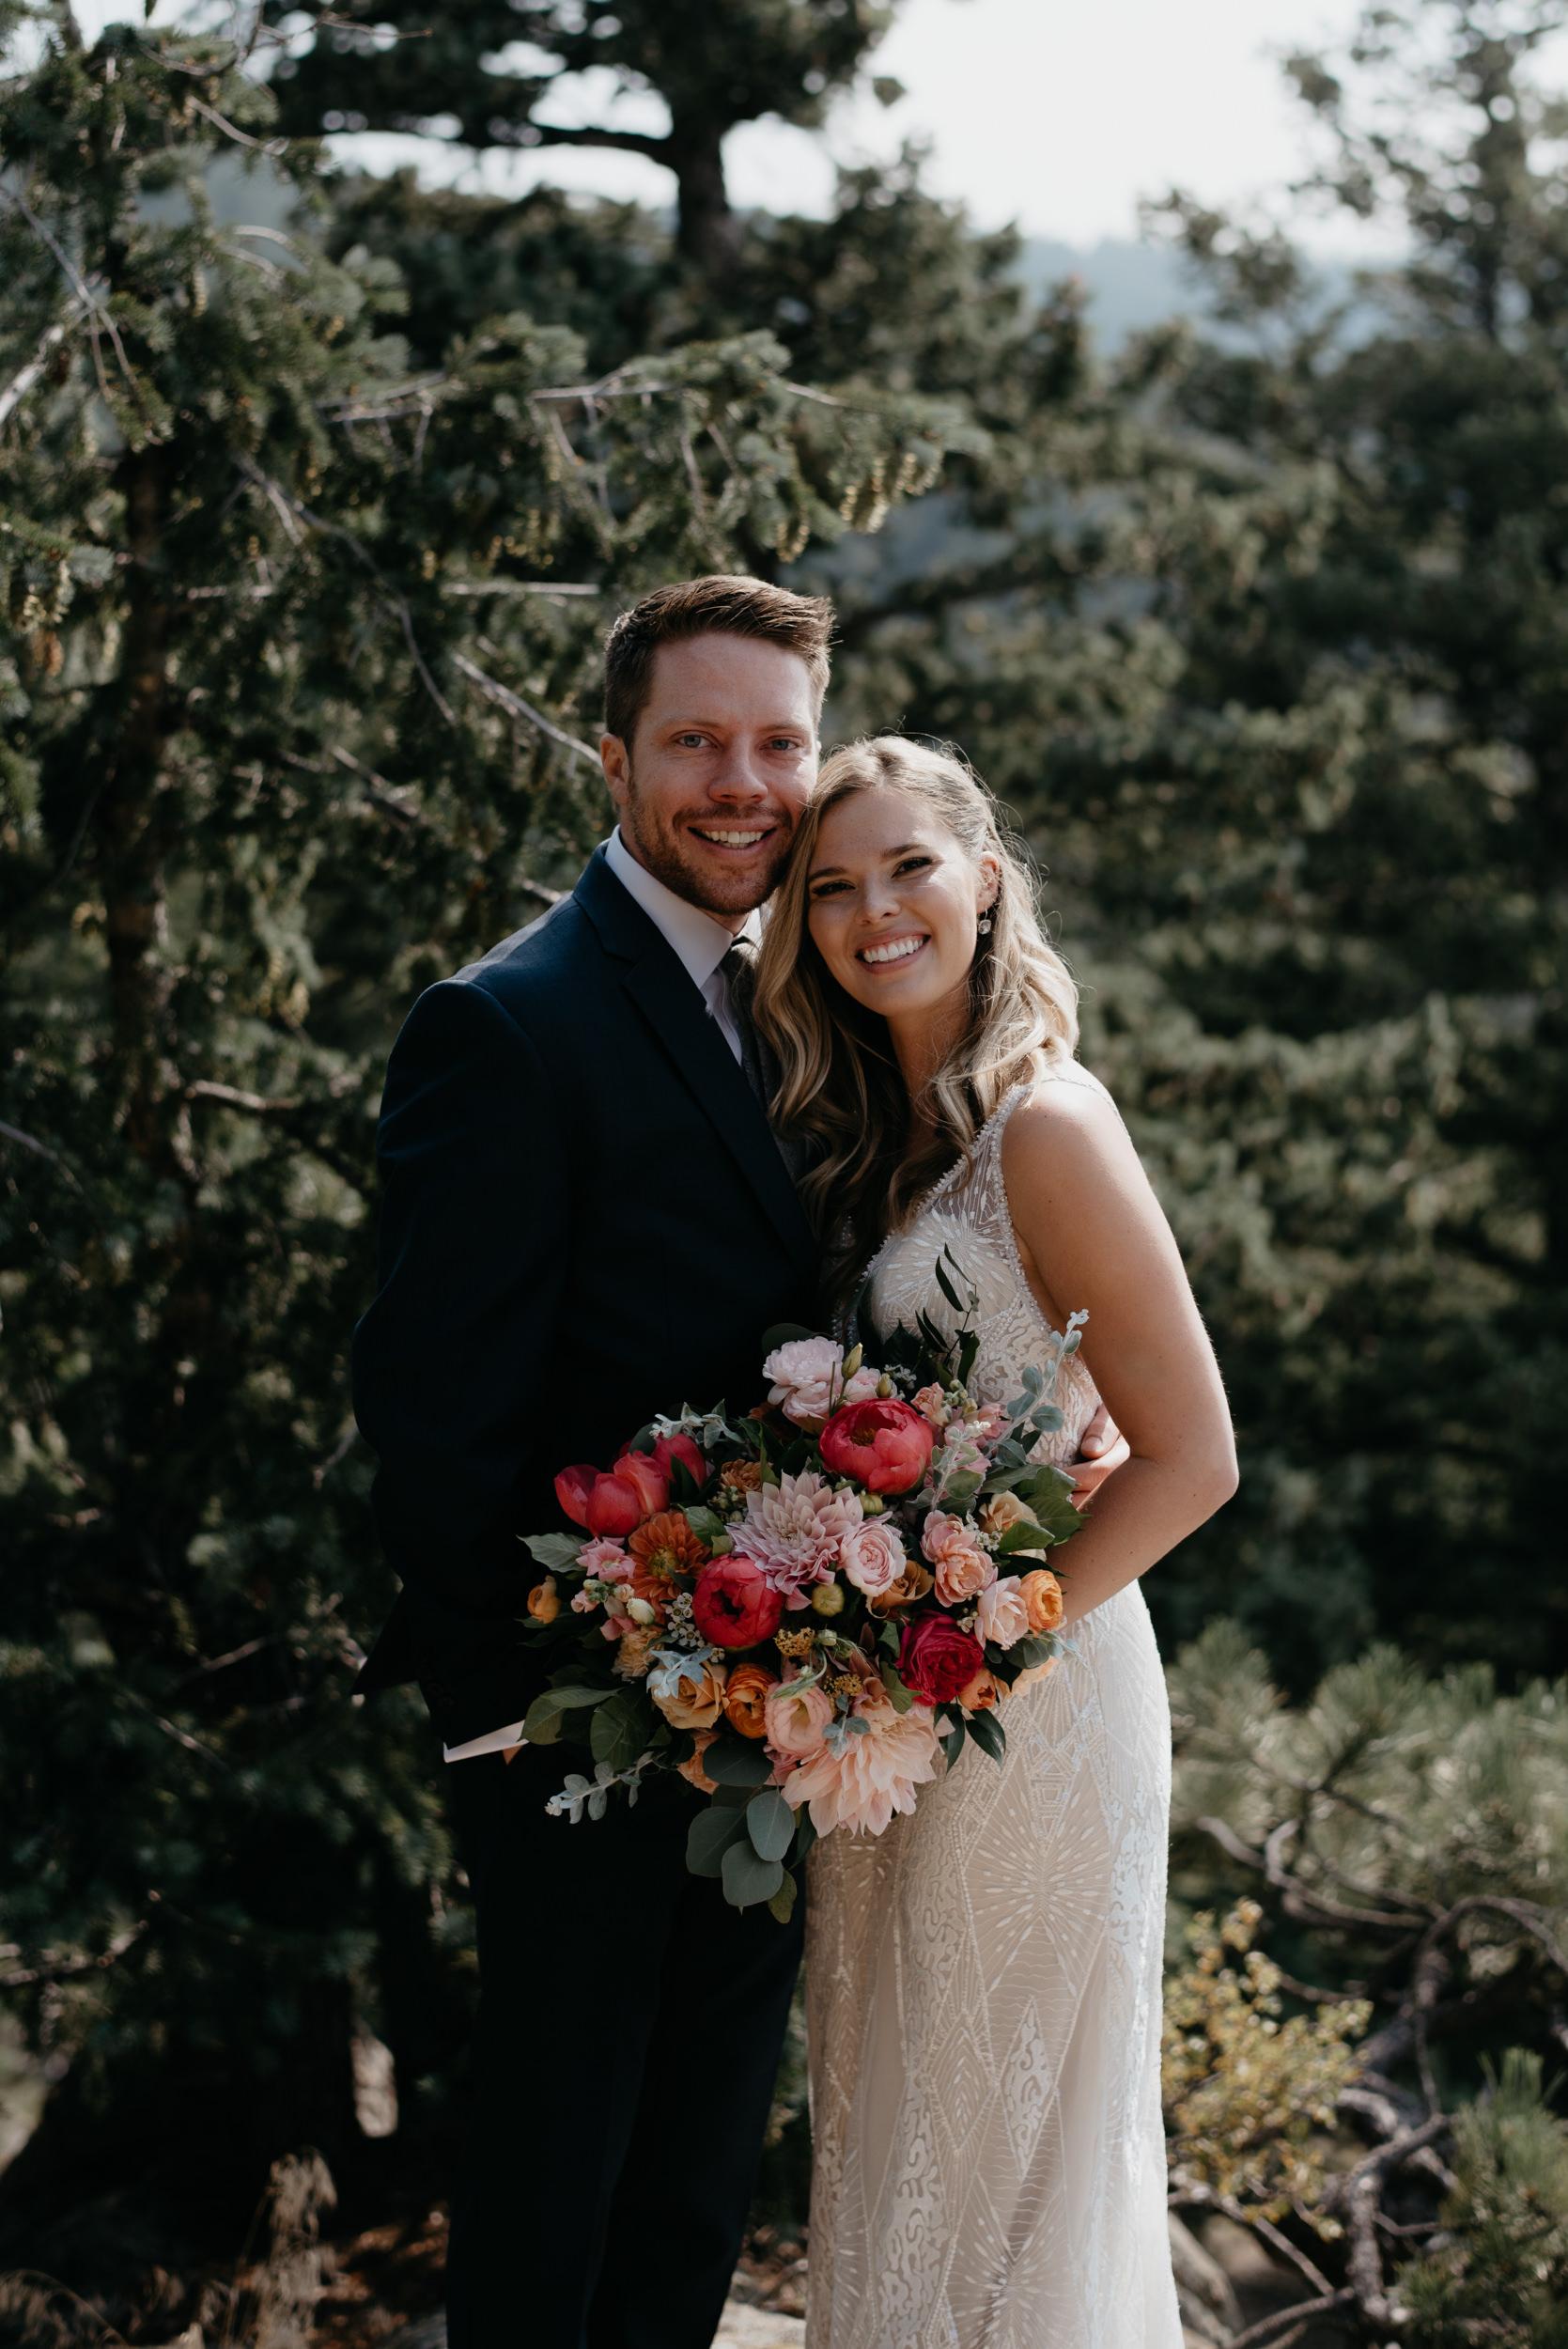 Boulder, Colorado elopement at Lost Gulch. Boulder wedding photos.